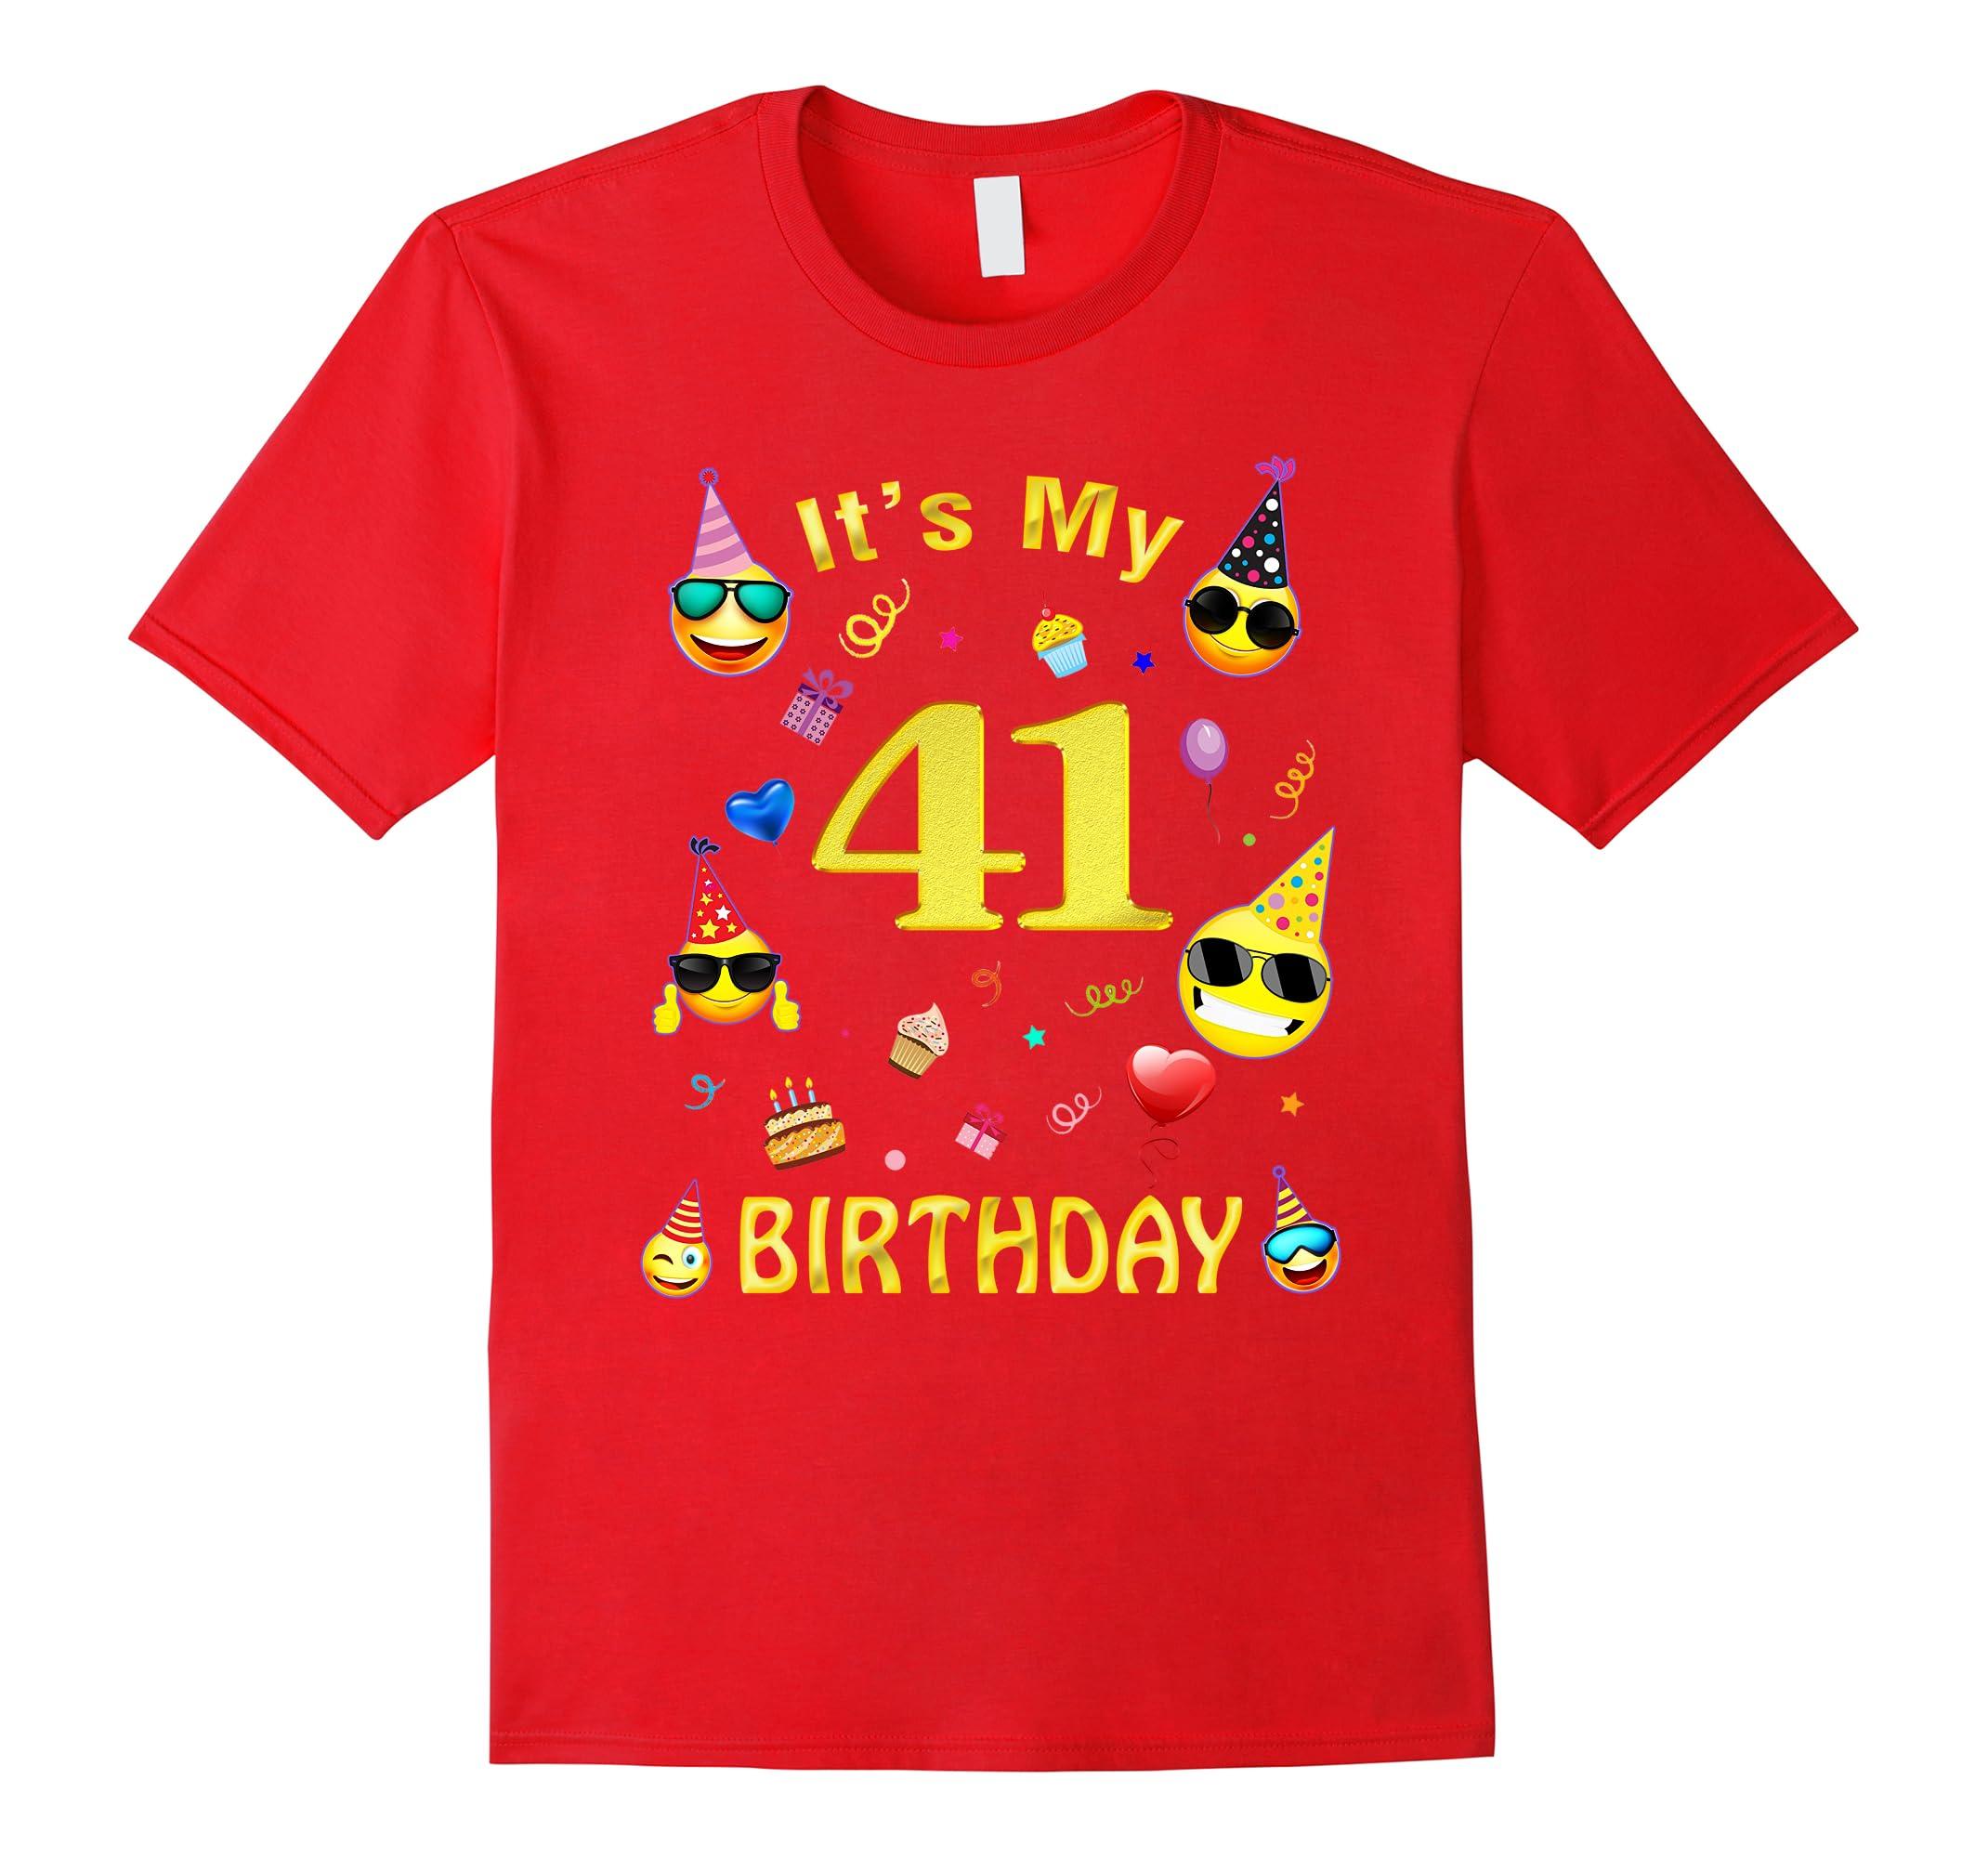 Its My 41st Birthday Shirt 41 Years Old Gift RT